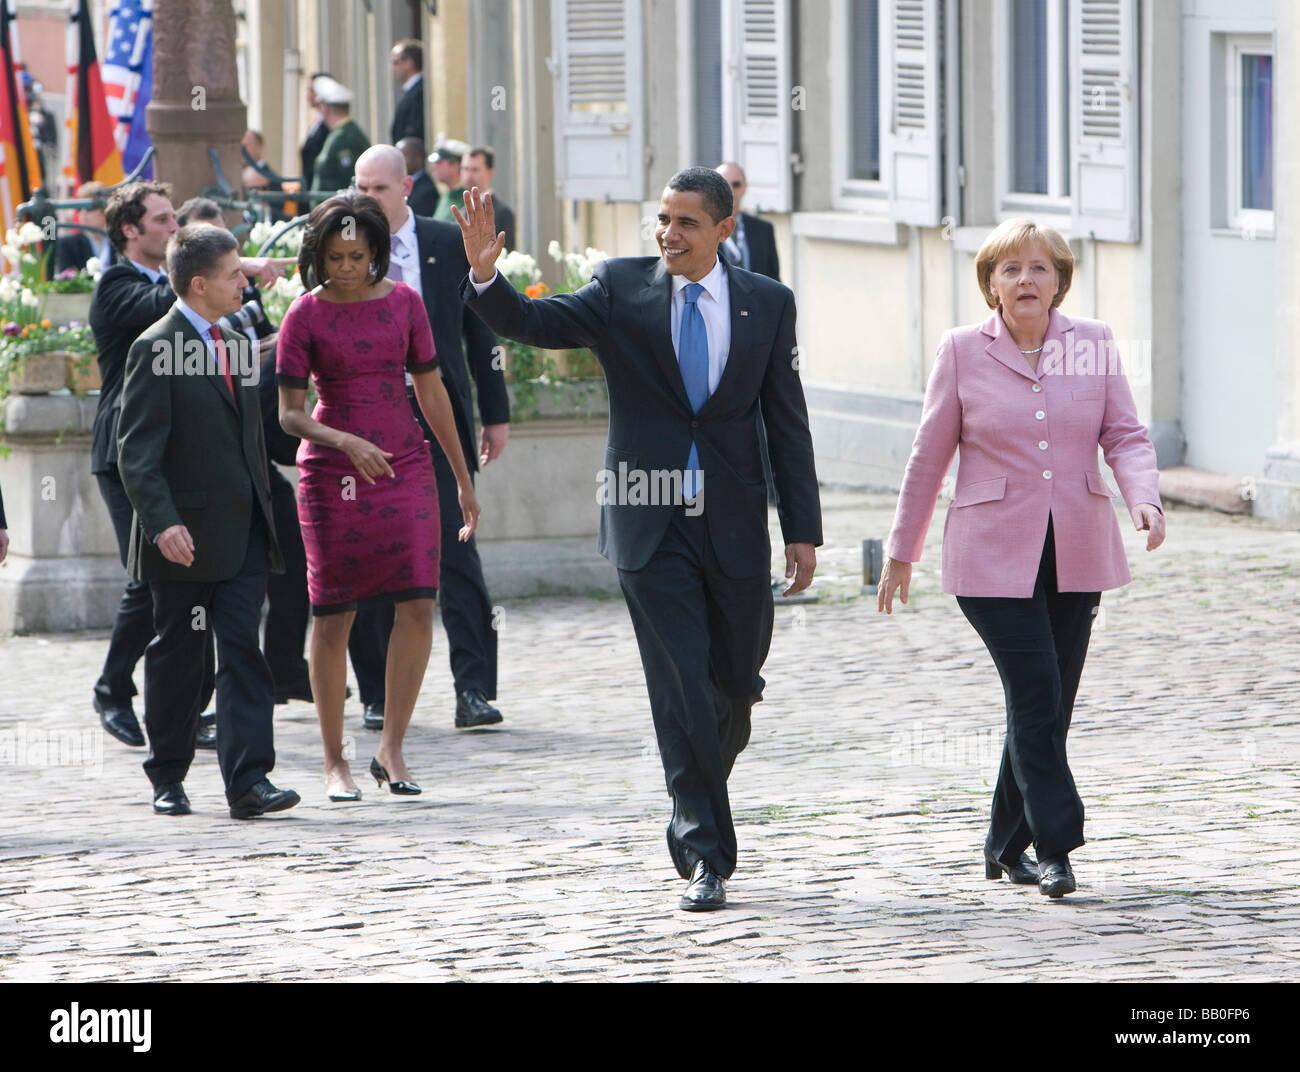 Angela MERKEL CDU Federal Chancellor of Germany and Chairman of the Christian Democratic Union CDU Barack OBAMA - Stock Image